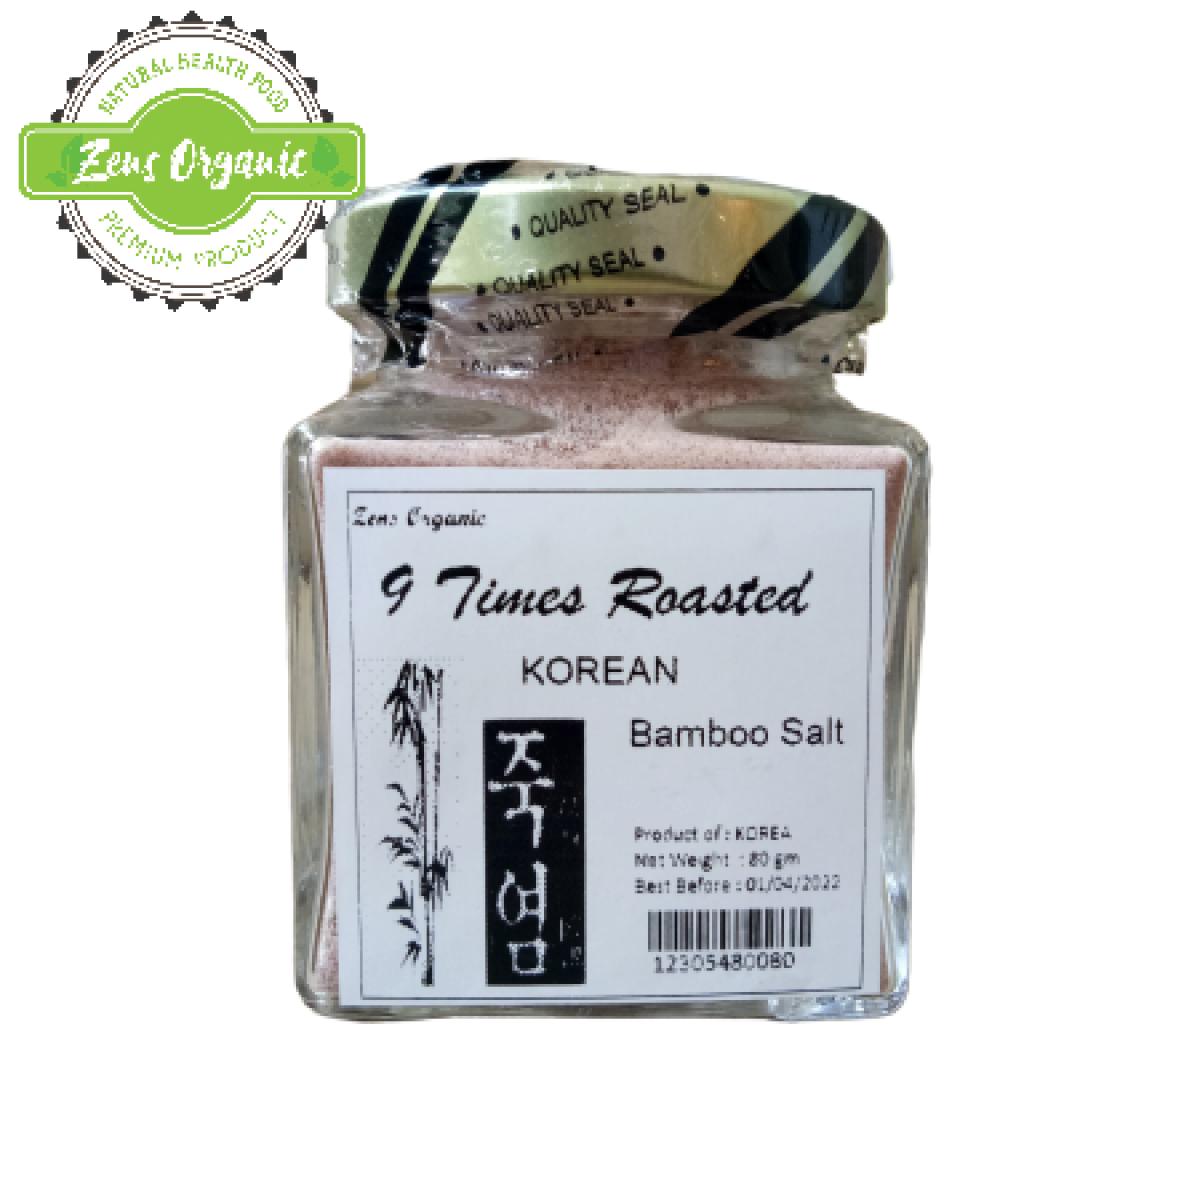 Zens Organic Premium 9 Times Roasted Bamboo Salt 80g